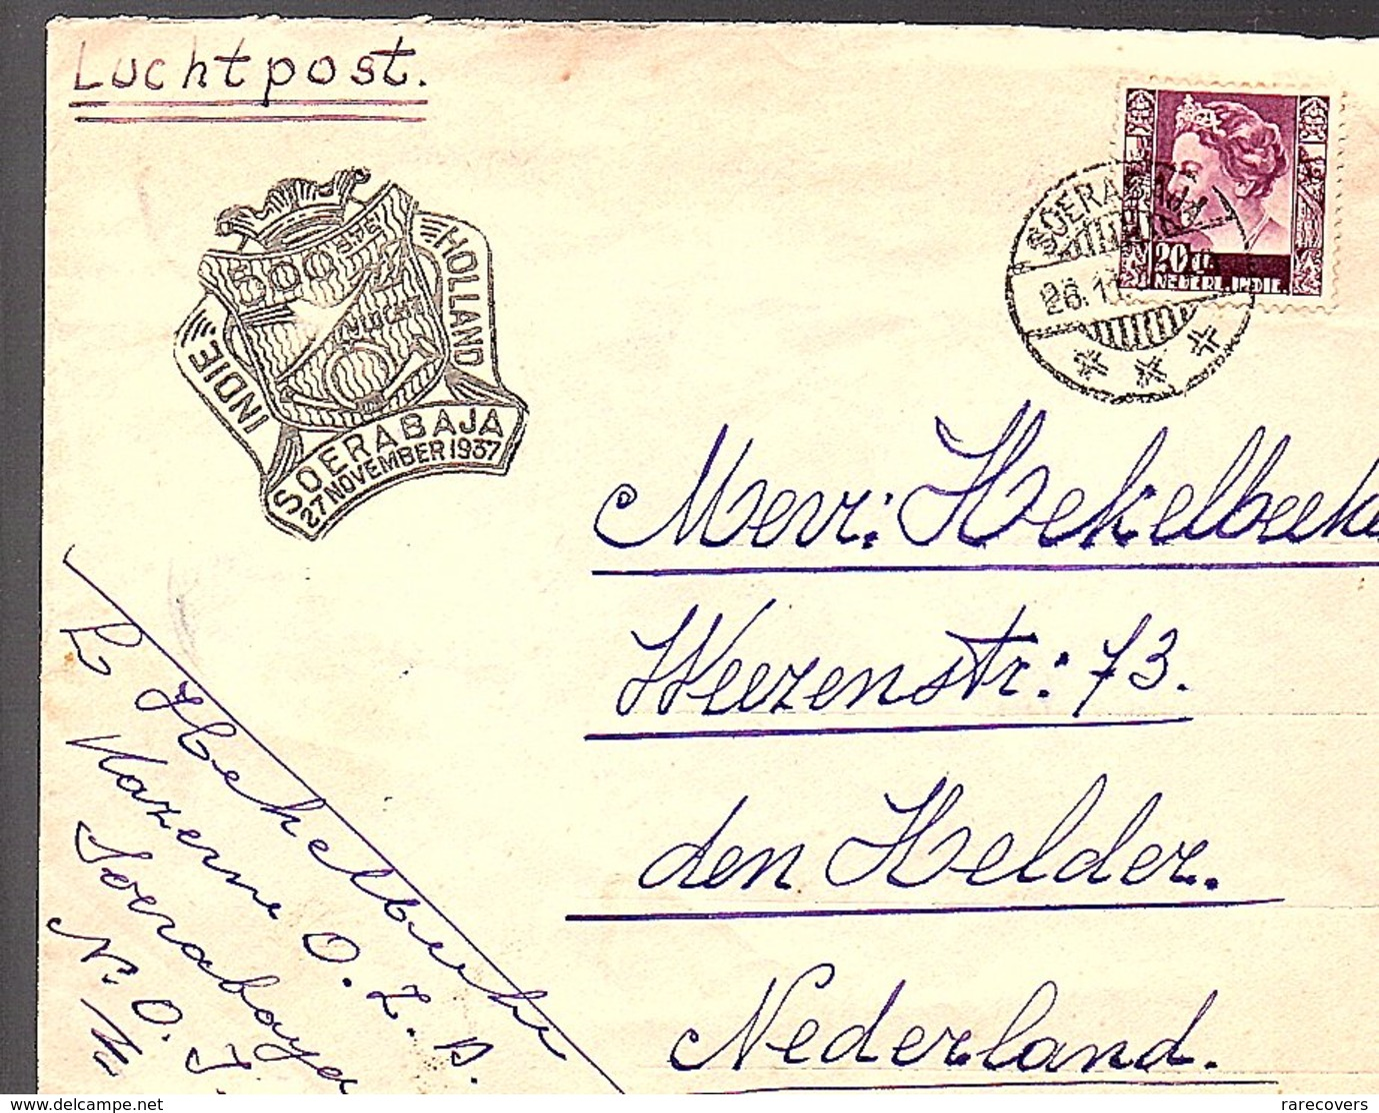 1937 Soerabaja Kazerne O.Z.A. > Hekelbeeke Weezenstraat 73 Den HeLder (272) - Indes Néerlandaises